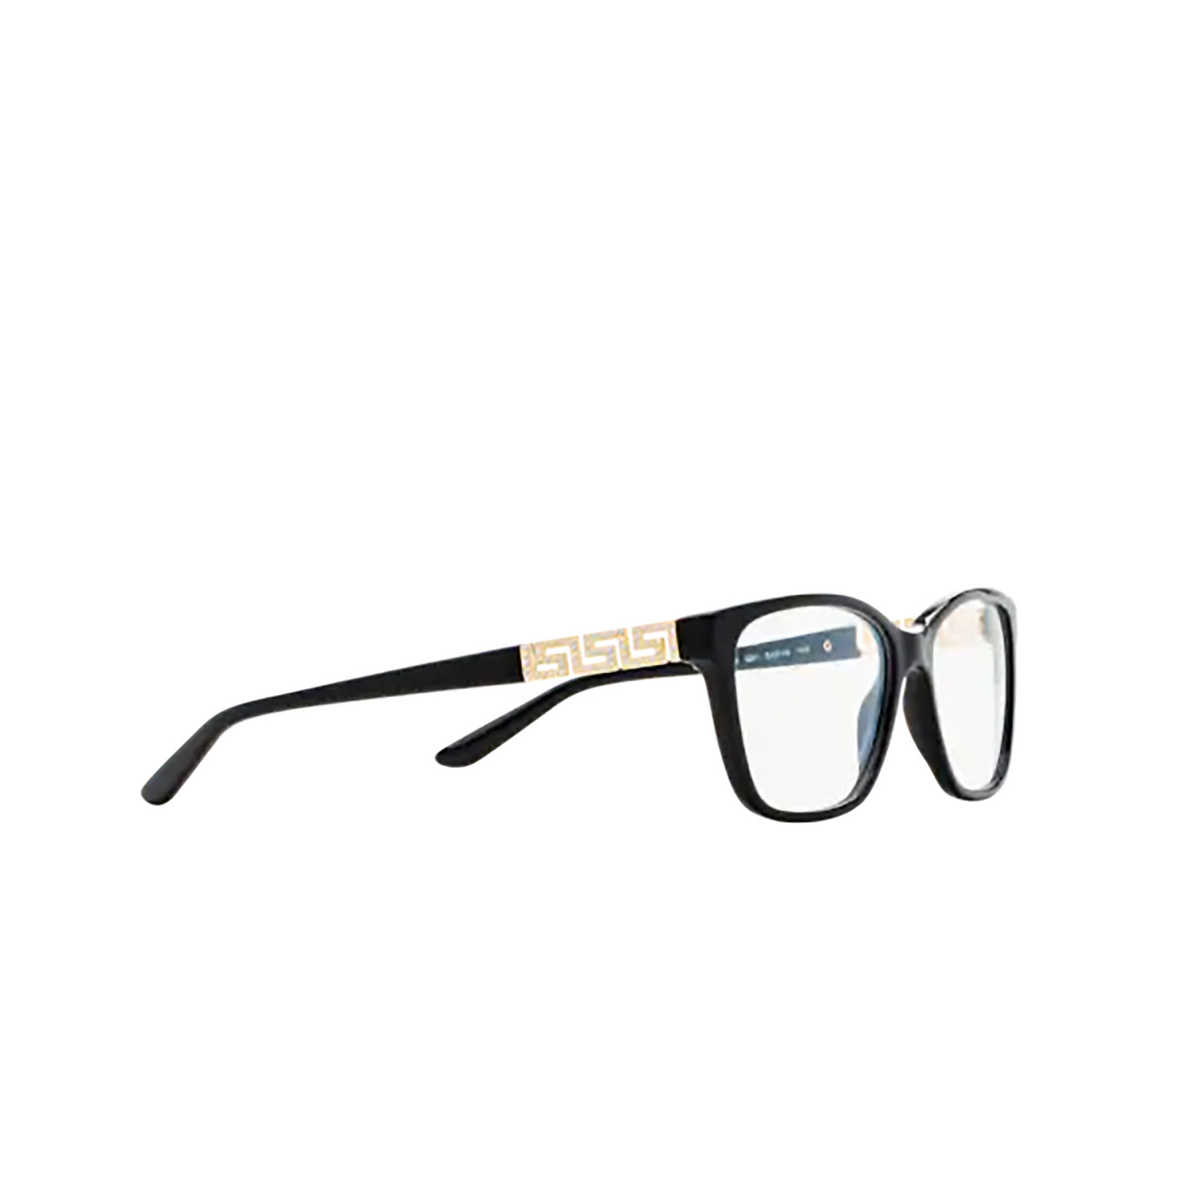 Versace® Butterfly Eyeglasses: VE3192B color Black GB1 - three-quarters view.